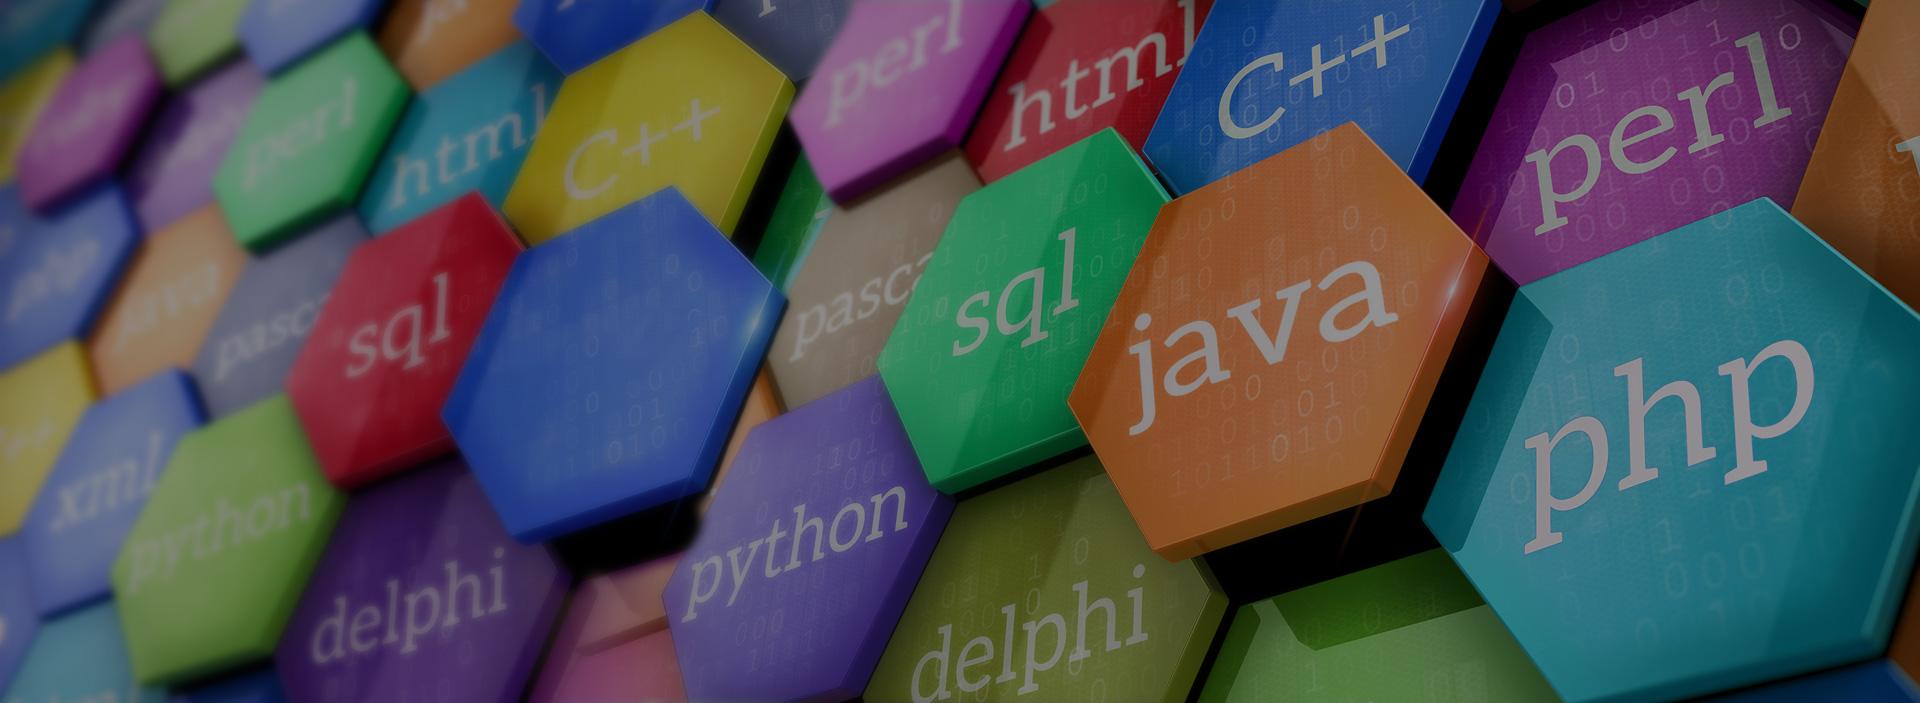 Where to find Java developers: UK vs Ukraine vs India